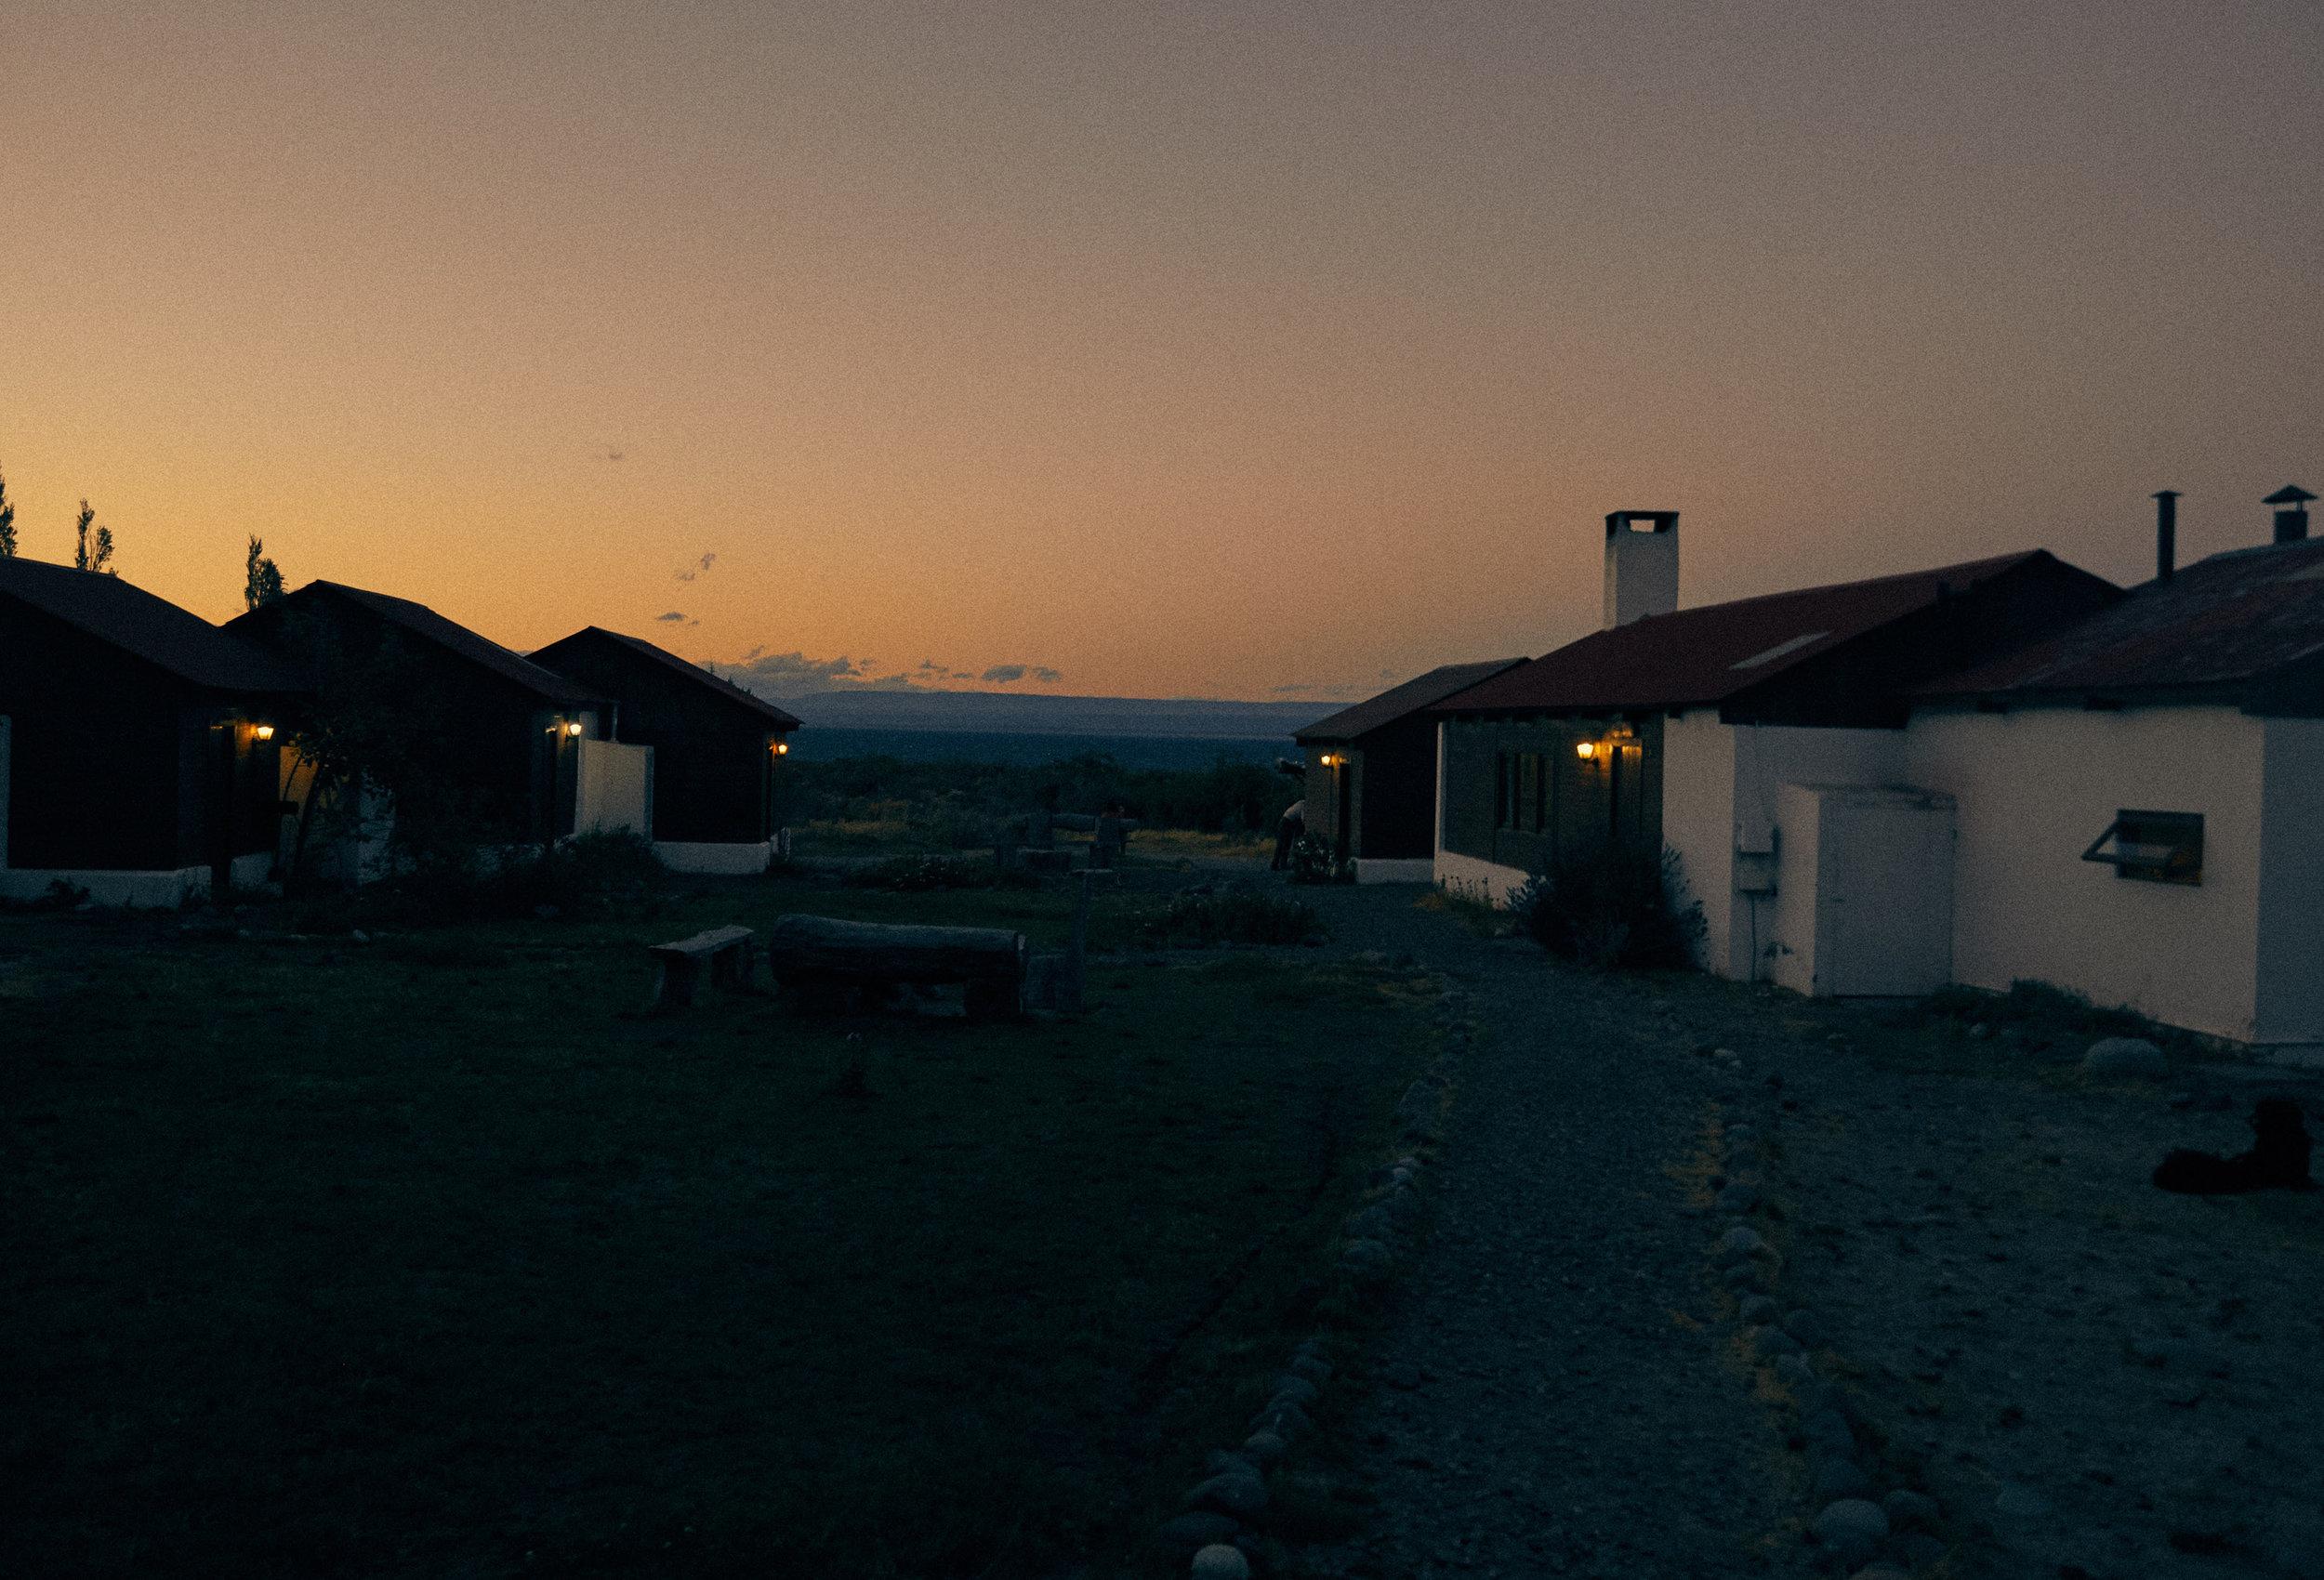 patagonia32327.jpg